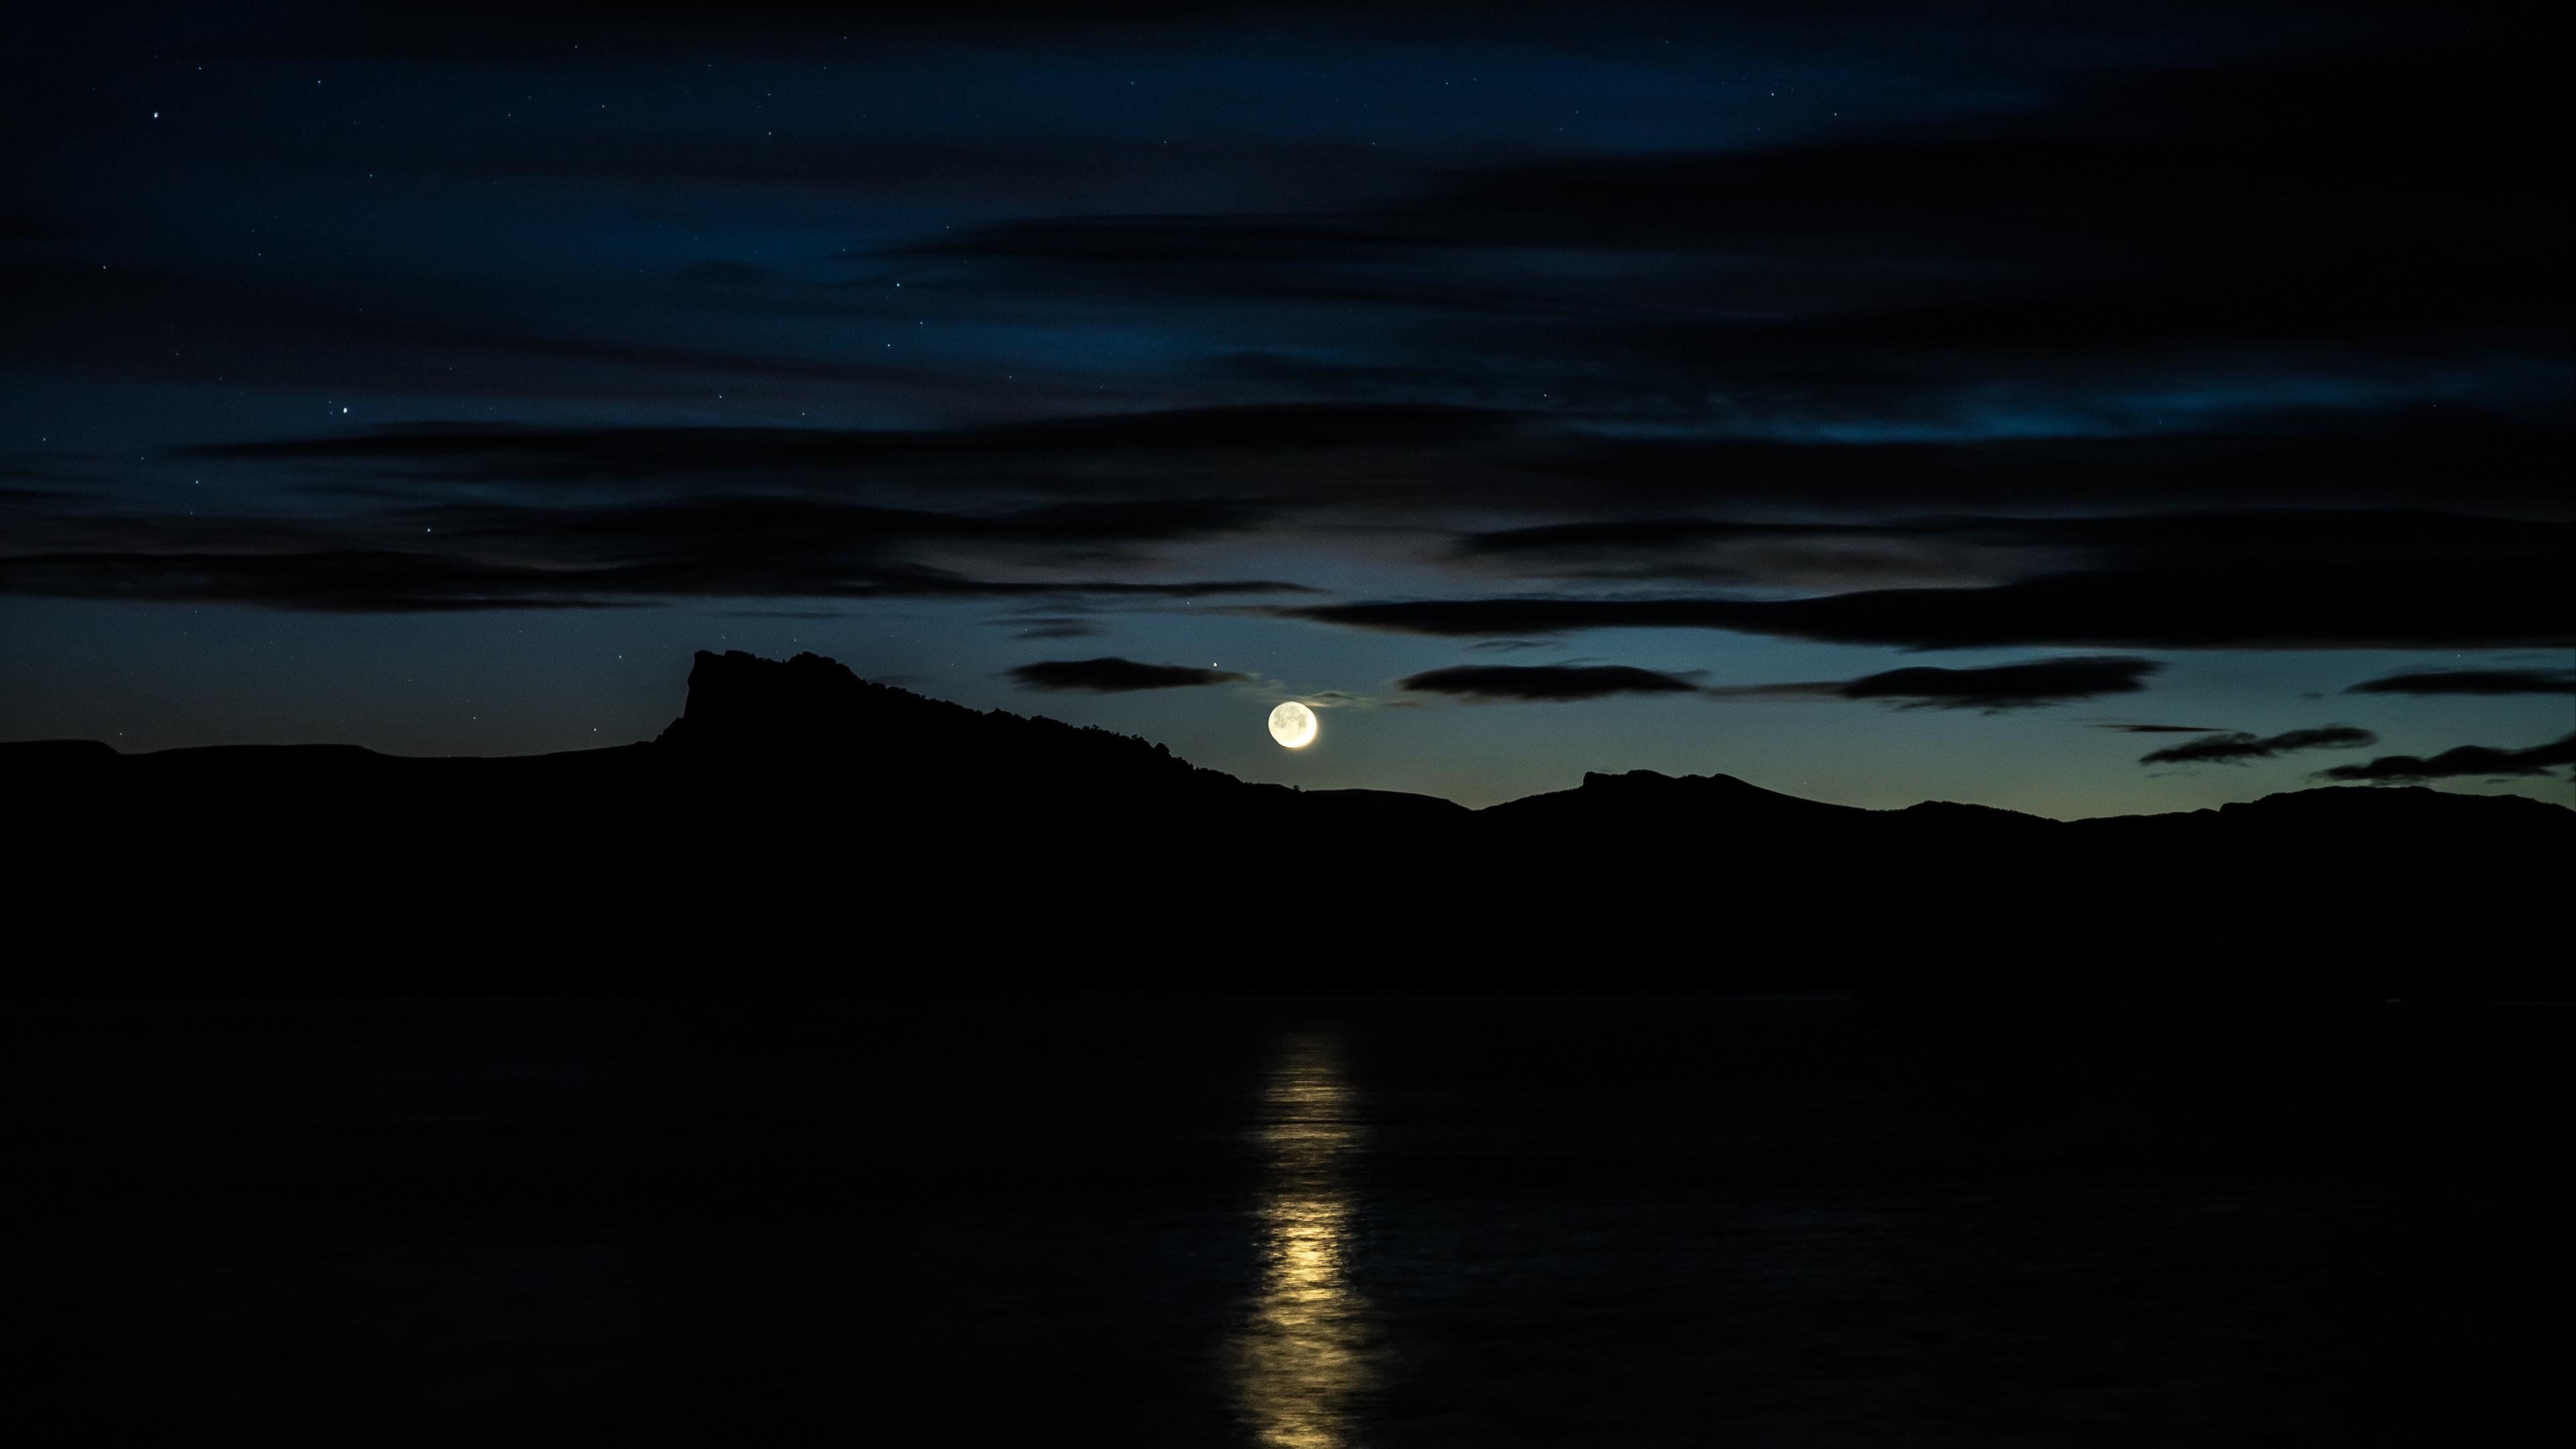 moon sky horizon river mountains 4k 1540576074 - moon, sky, horizon, river, mountains 4k - Sky, Moon, Horizon